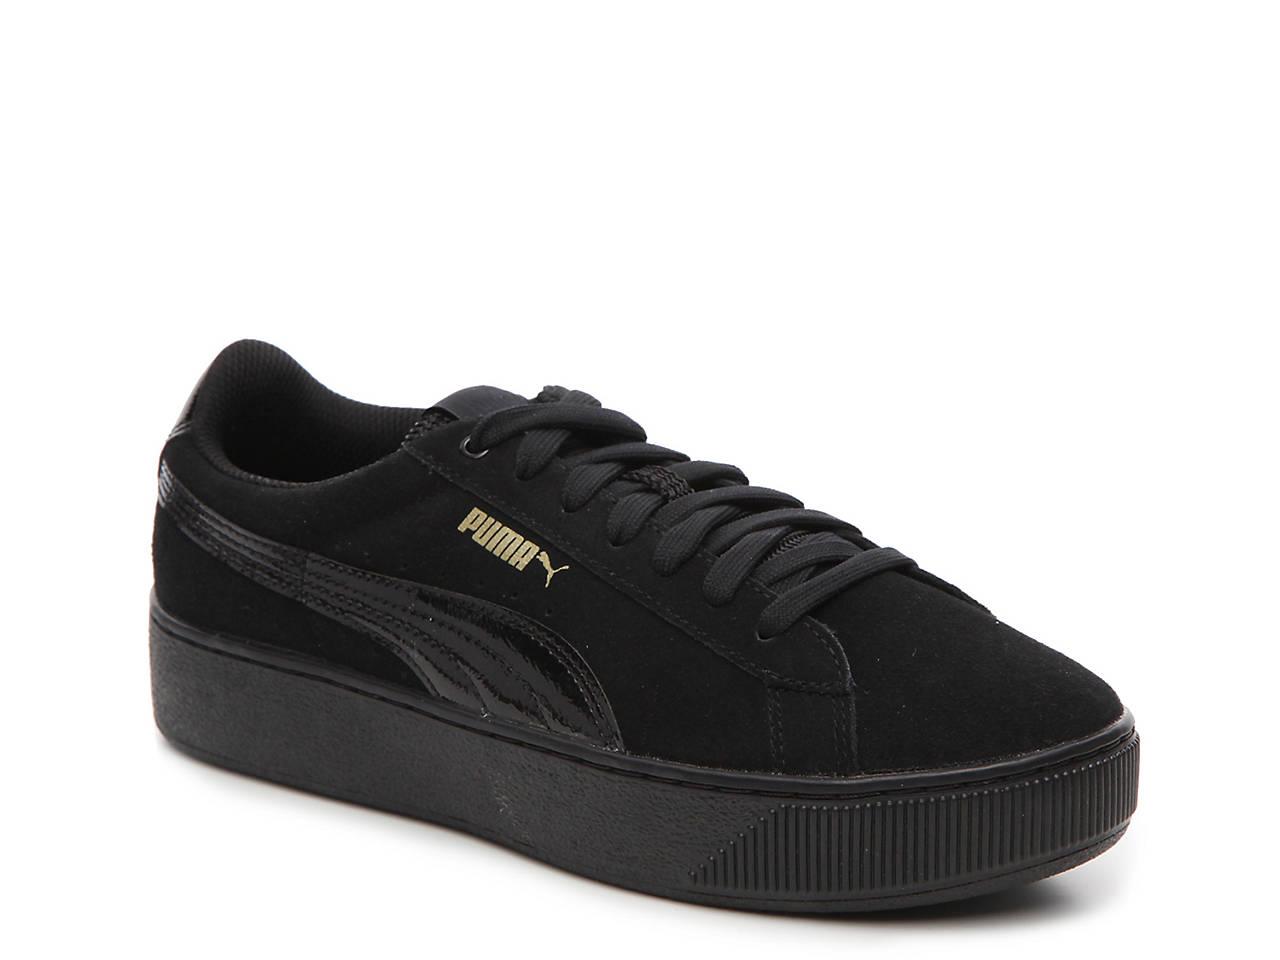 cd06604c218 Puma Vikky Mono Platform Sneaker - Women s Women s Shoes